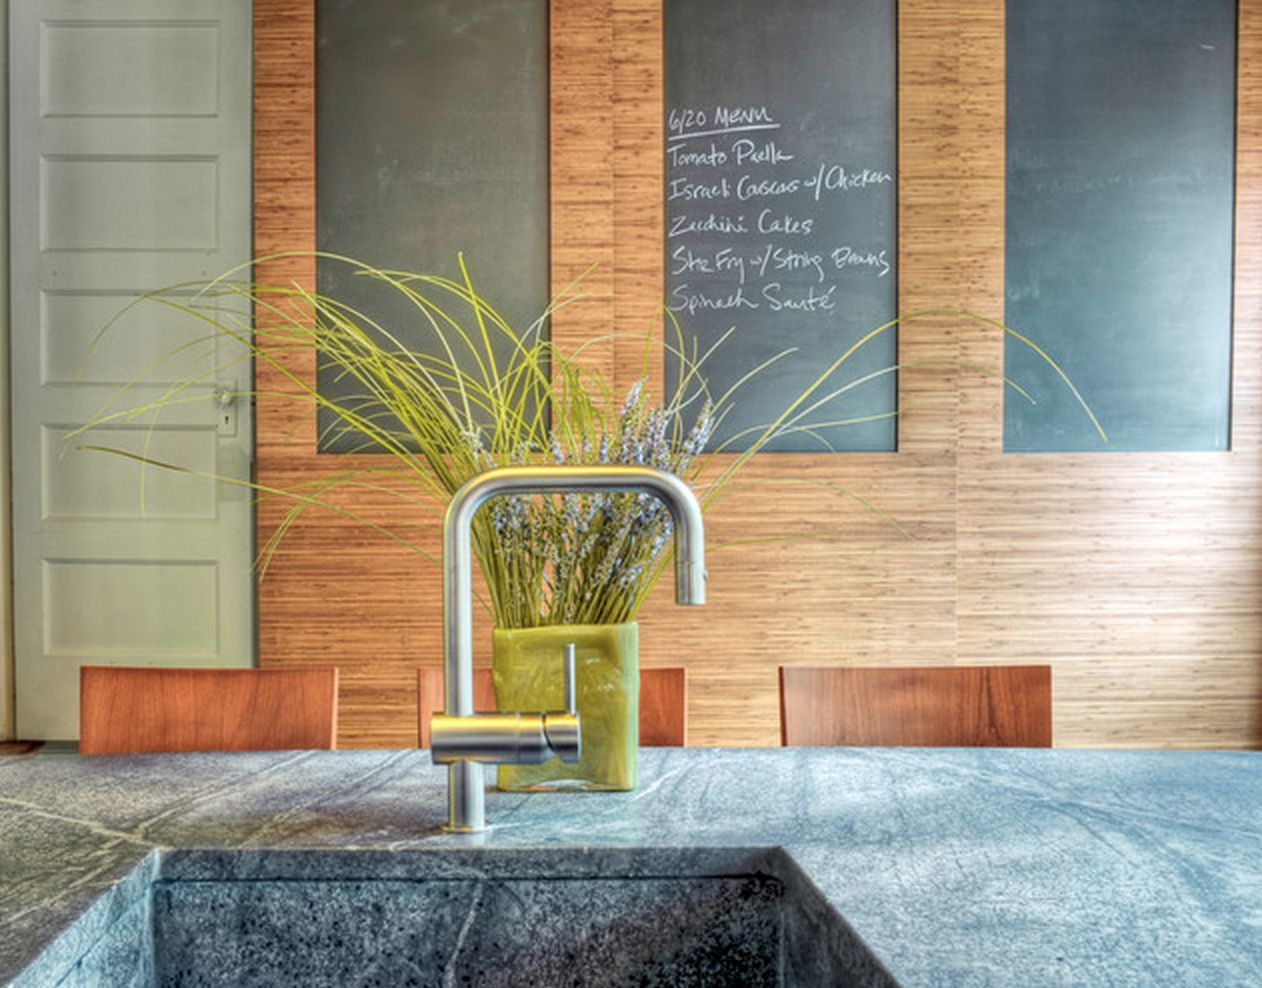 soapstone countertops kitchen countertop materials Home Decorating Trends Homedit